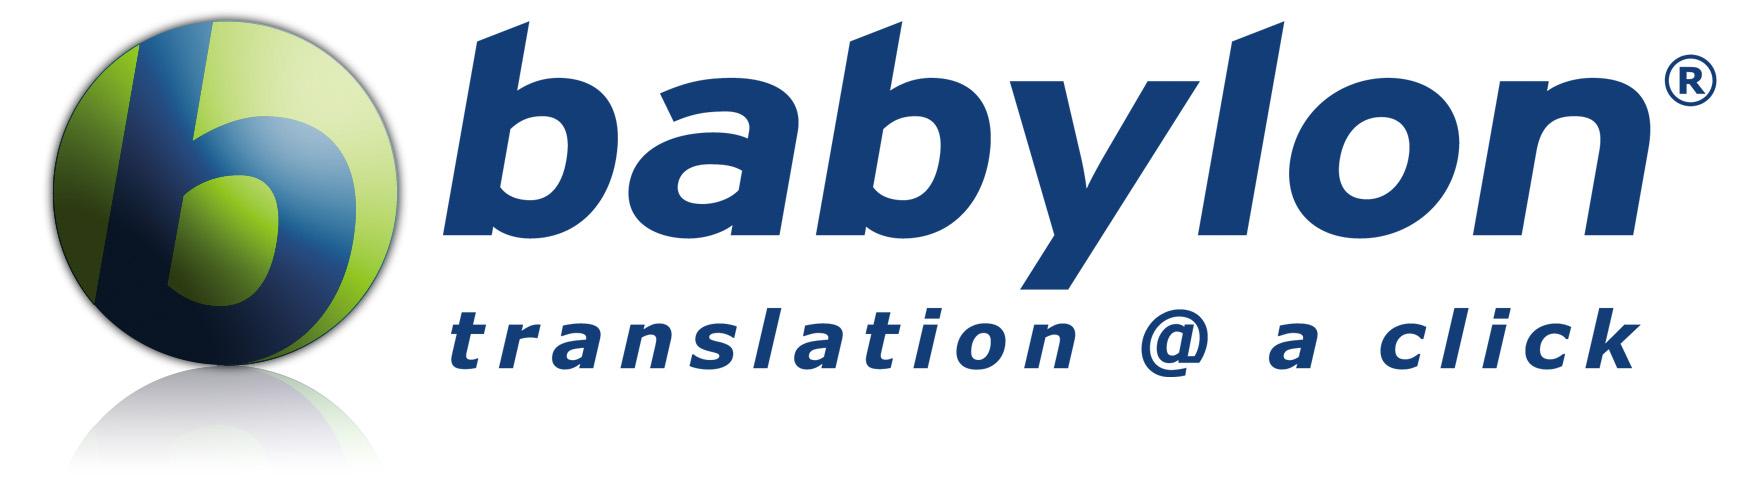 babylon software wikipedia